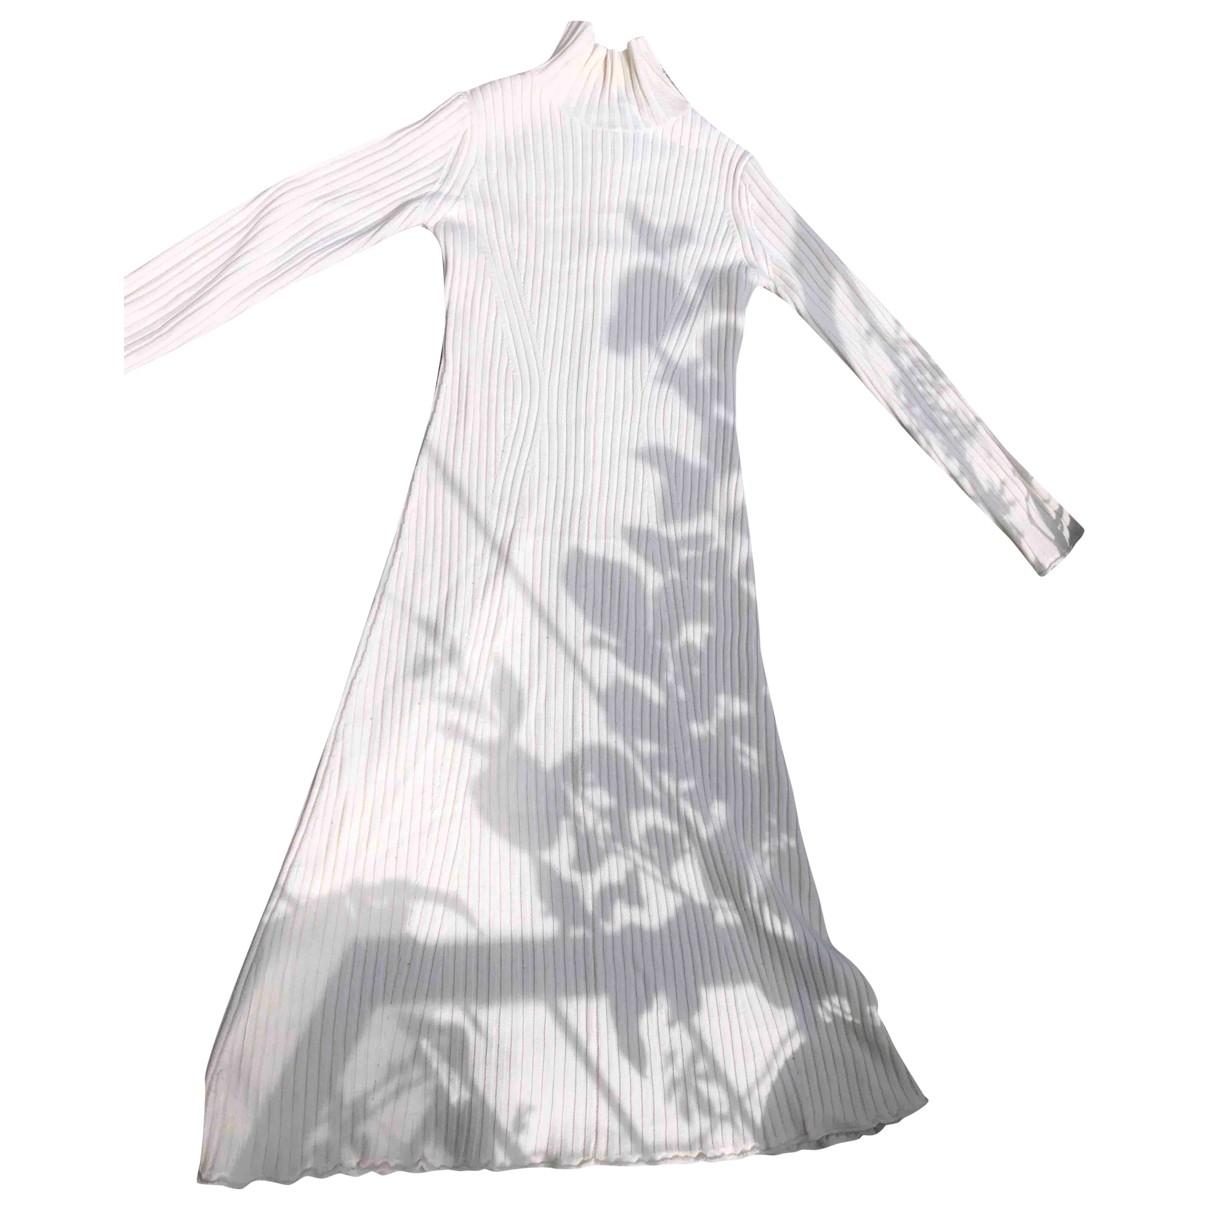 Zara \N Ecru Wool dress for Women XS International